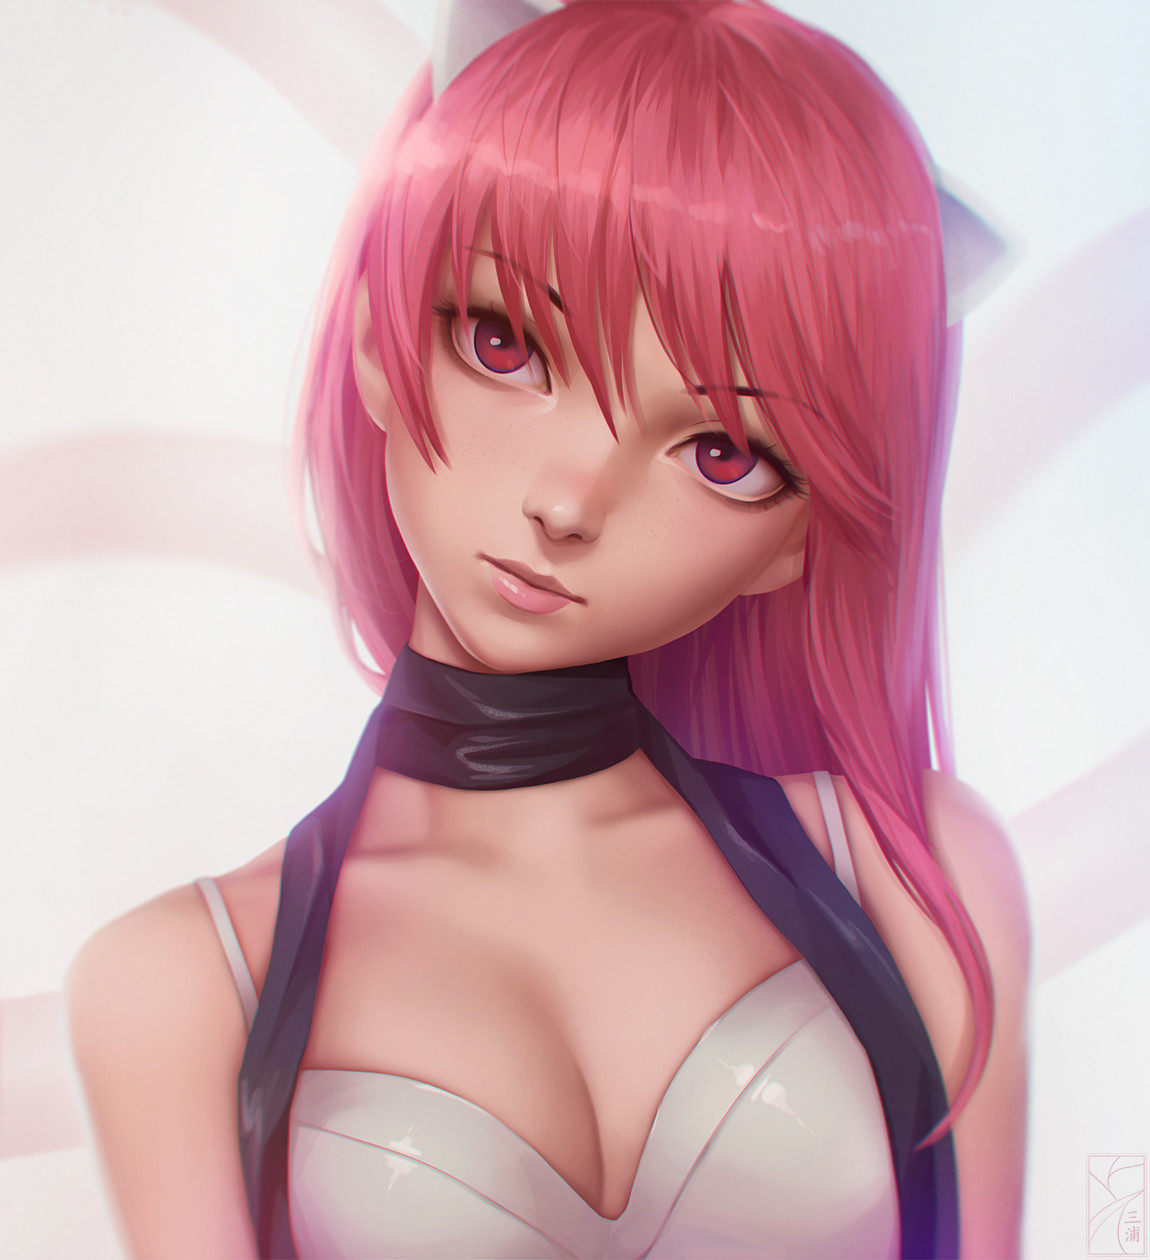 Digital Art by Miura Naoko (miura-n315)